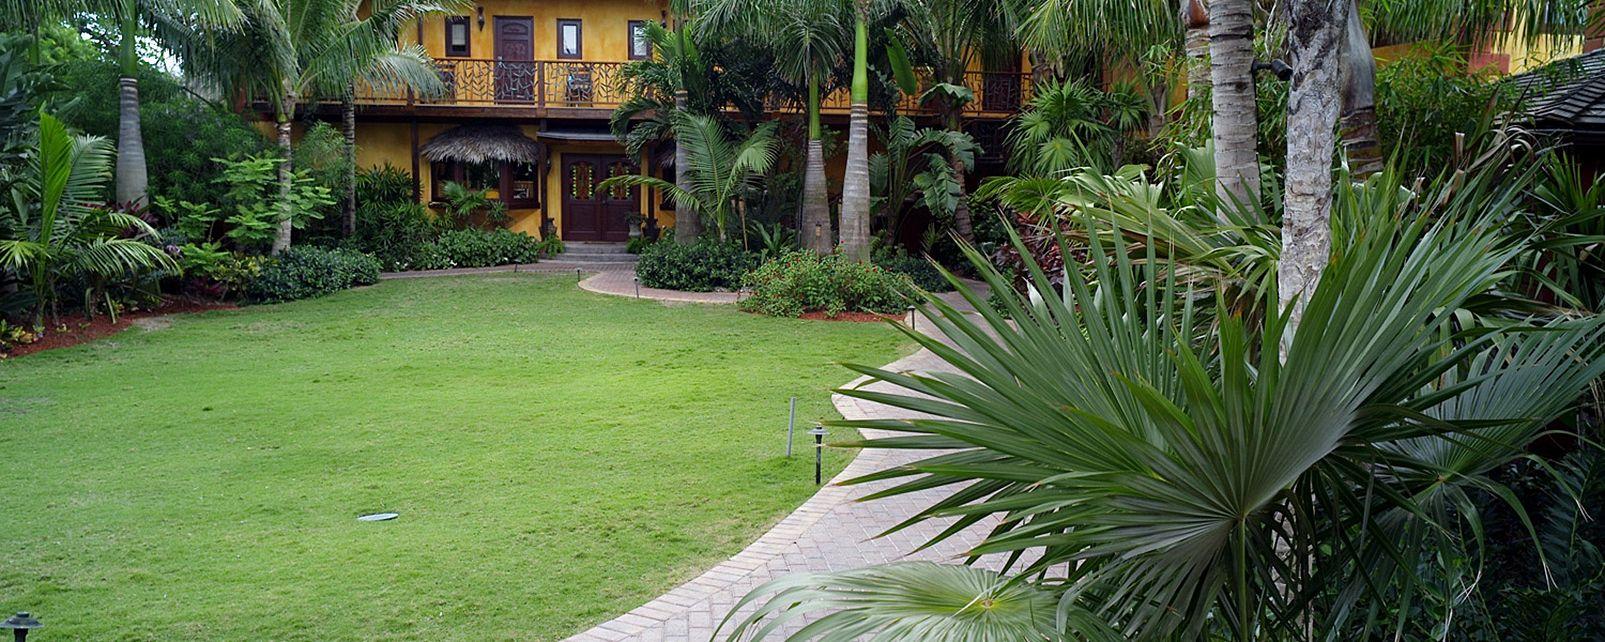 Hôtel Marley Resort and Spa